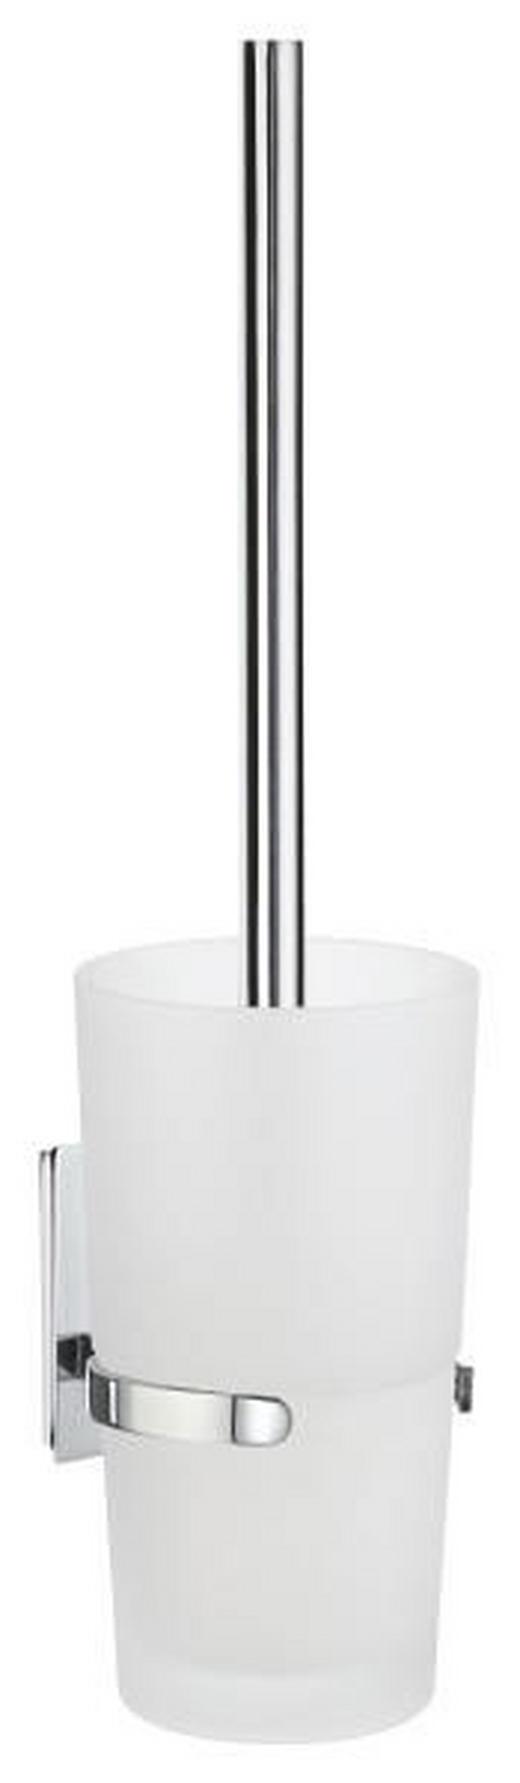 WC-BÜRSTENGARNITUR Glas - Chromfarben/Weiß, Basics, Glas/Kunststoff (9,6/38/11,5cm)